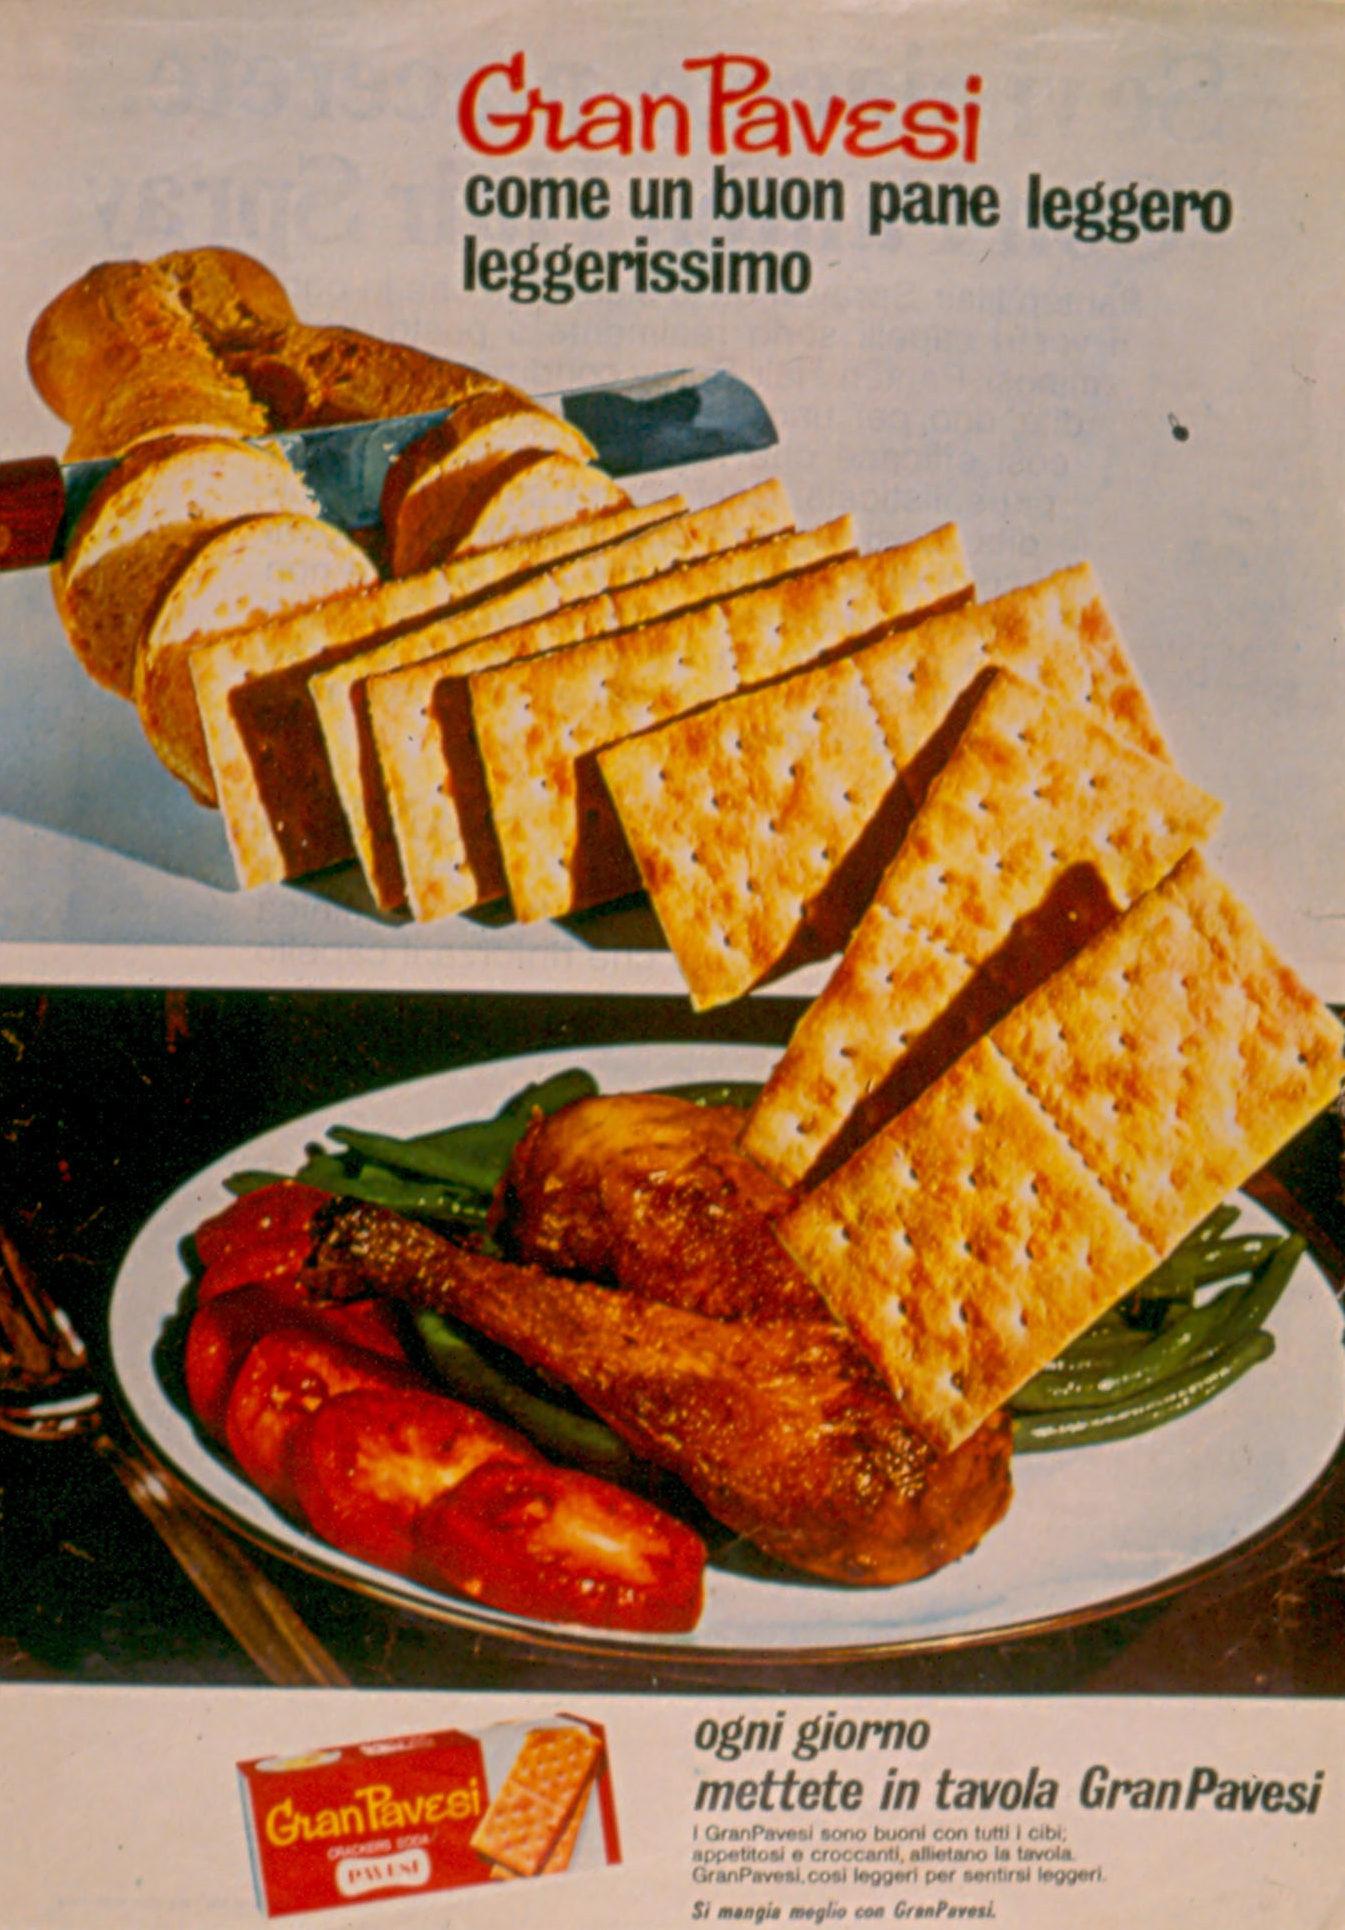 Press advertising Gran Pavesi Crackers, 1968